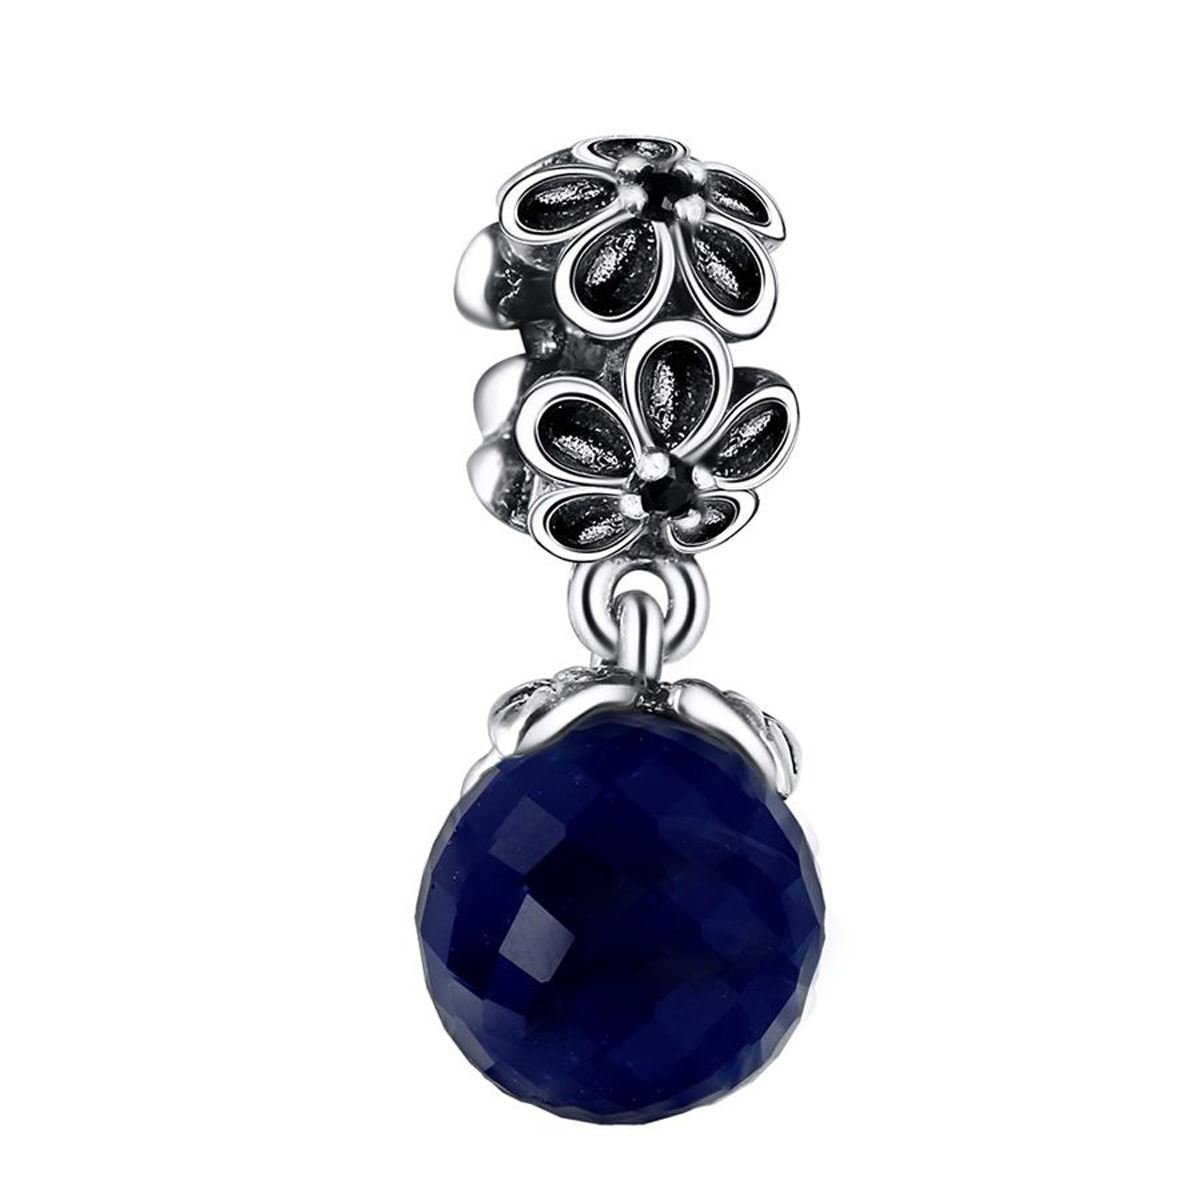 925 Sterling Silver Charms Blue Crystal Flower Pendant European Charm Fit Bracelet Bangle DIY Jewelry Fine Making